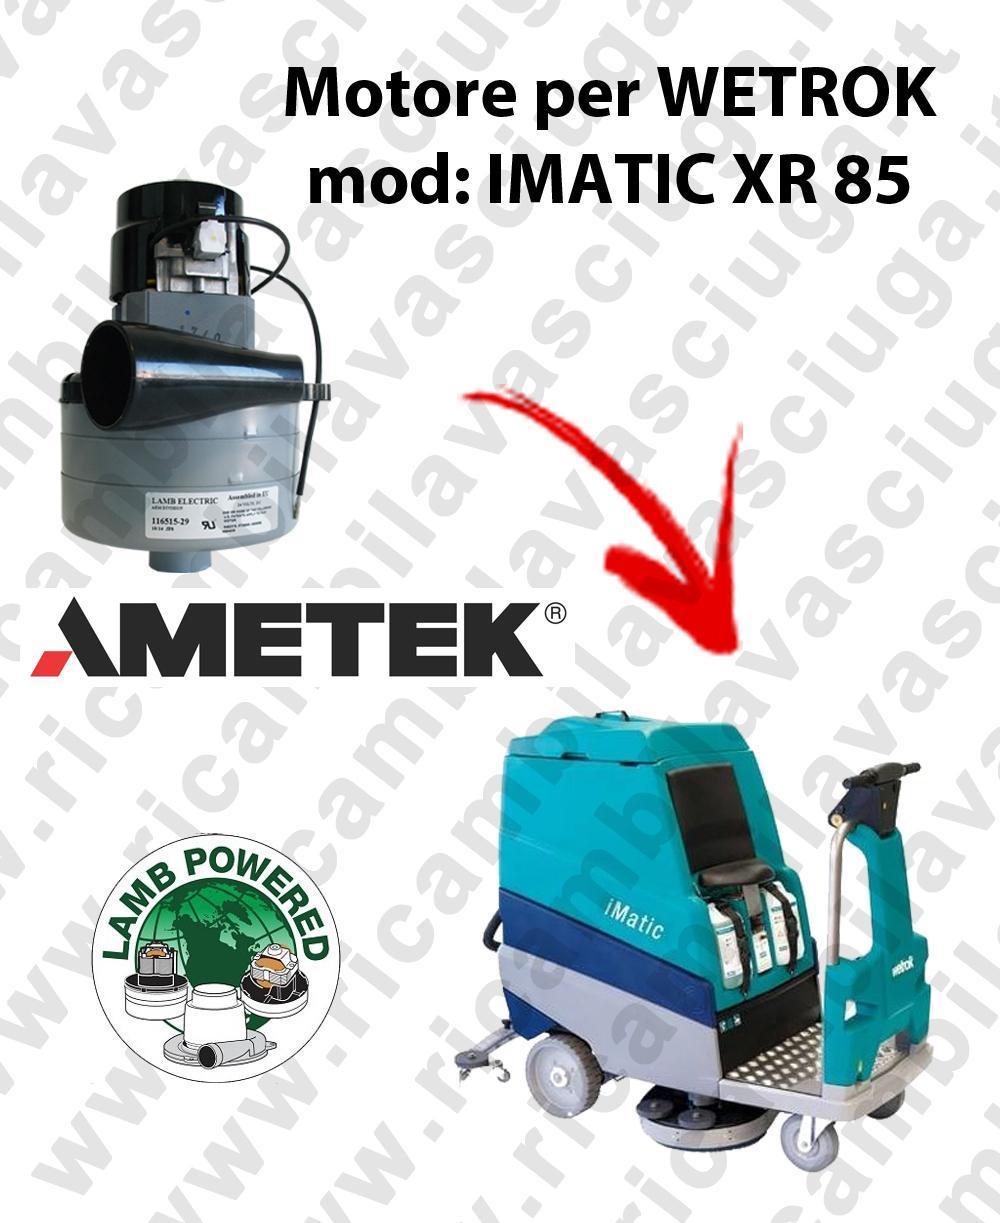 IMATIC XR 85 LAMB AMETEK vacuum motor for scrubber dryer WETROK